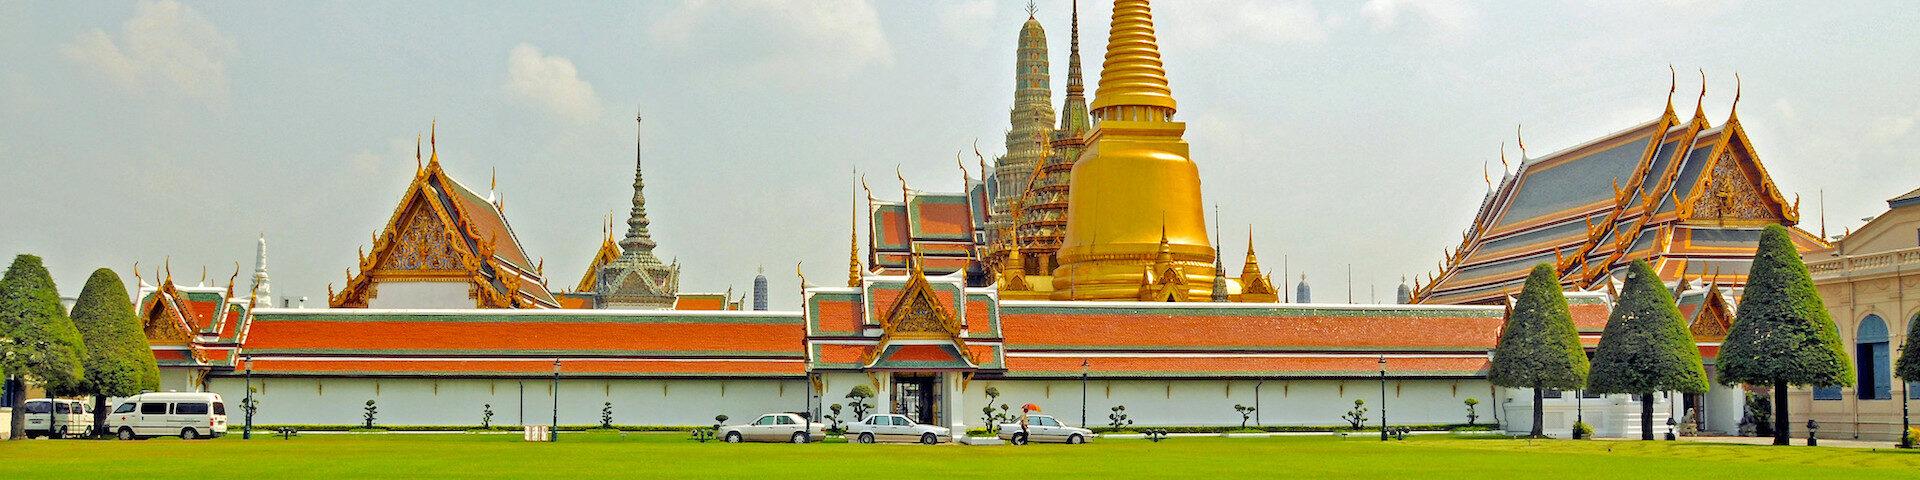 10 days Thailand itinerary